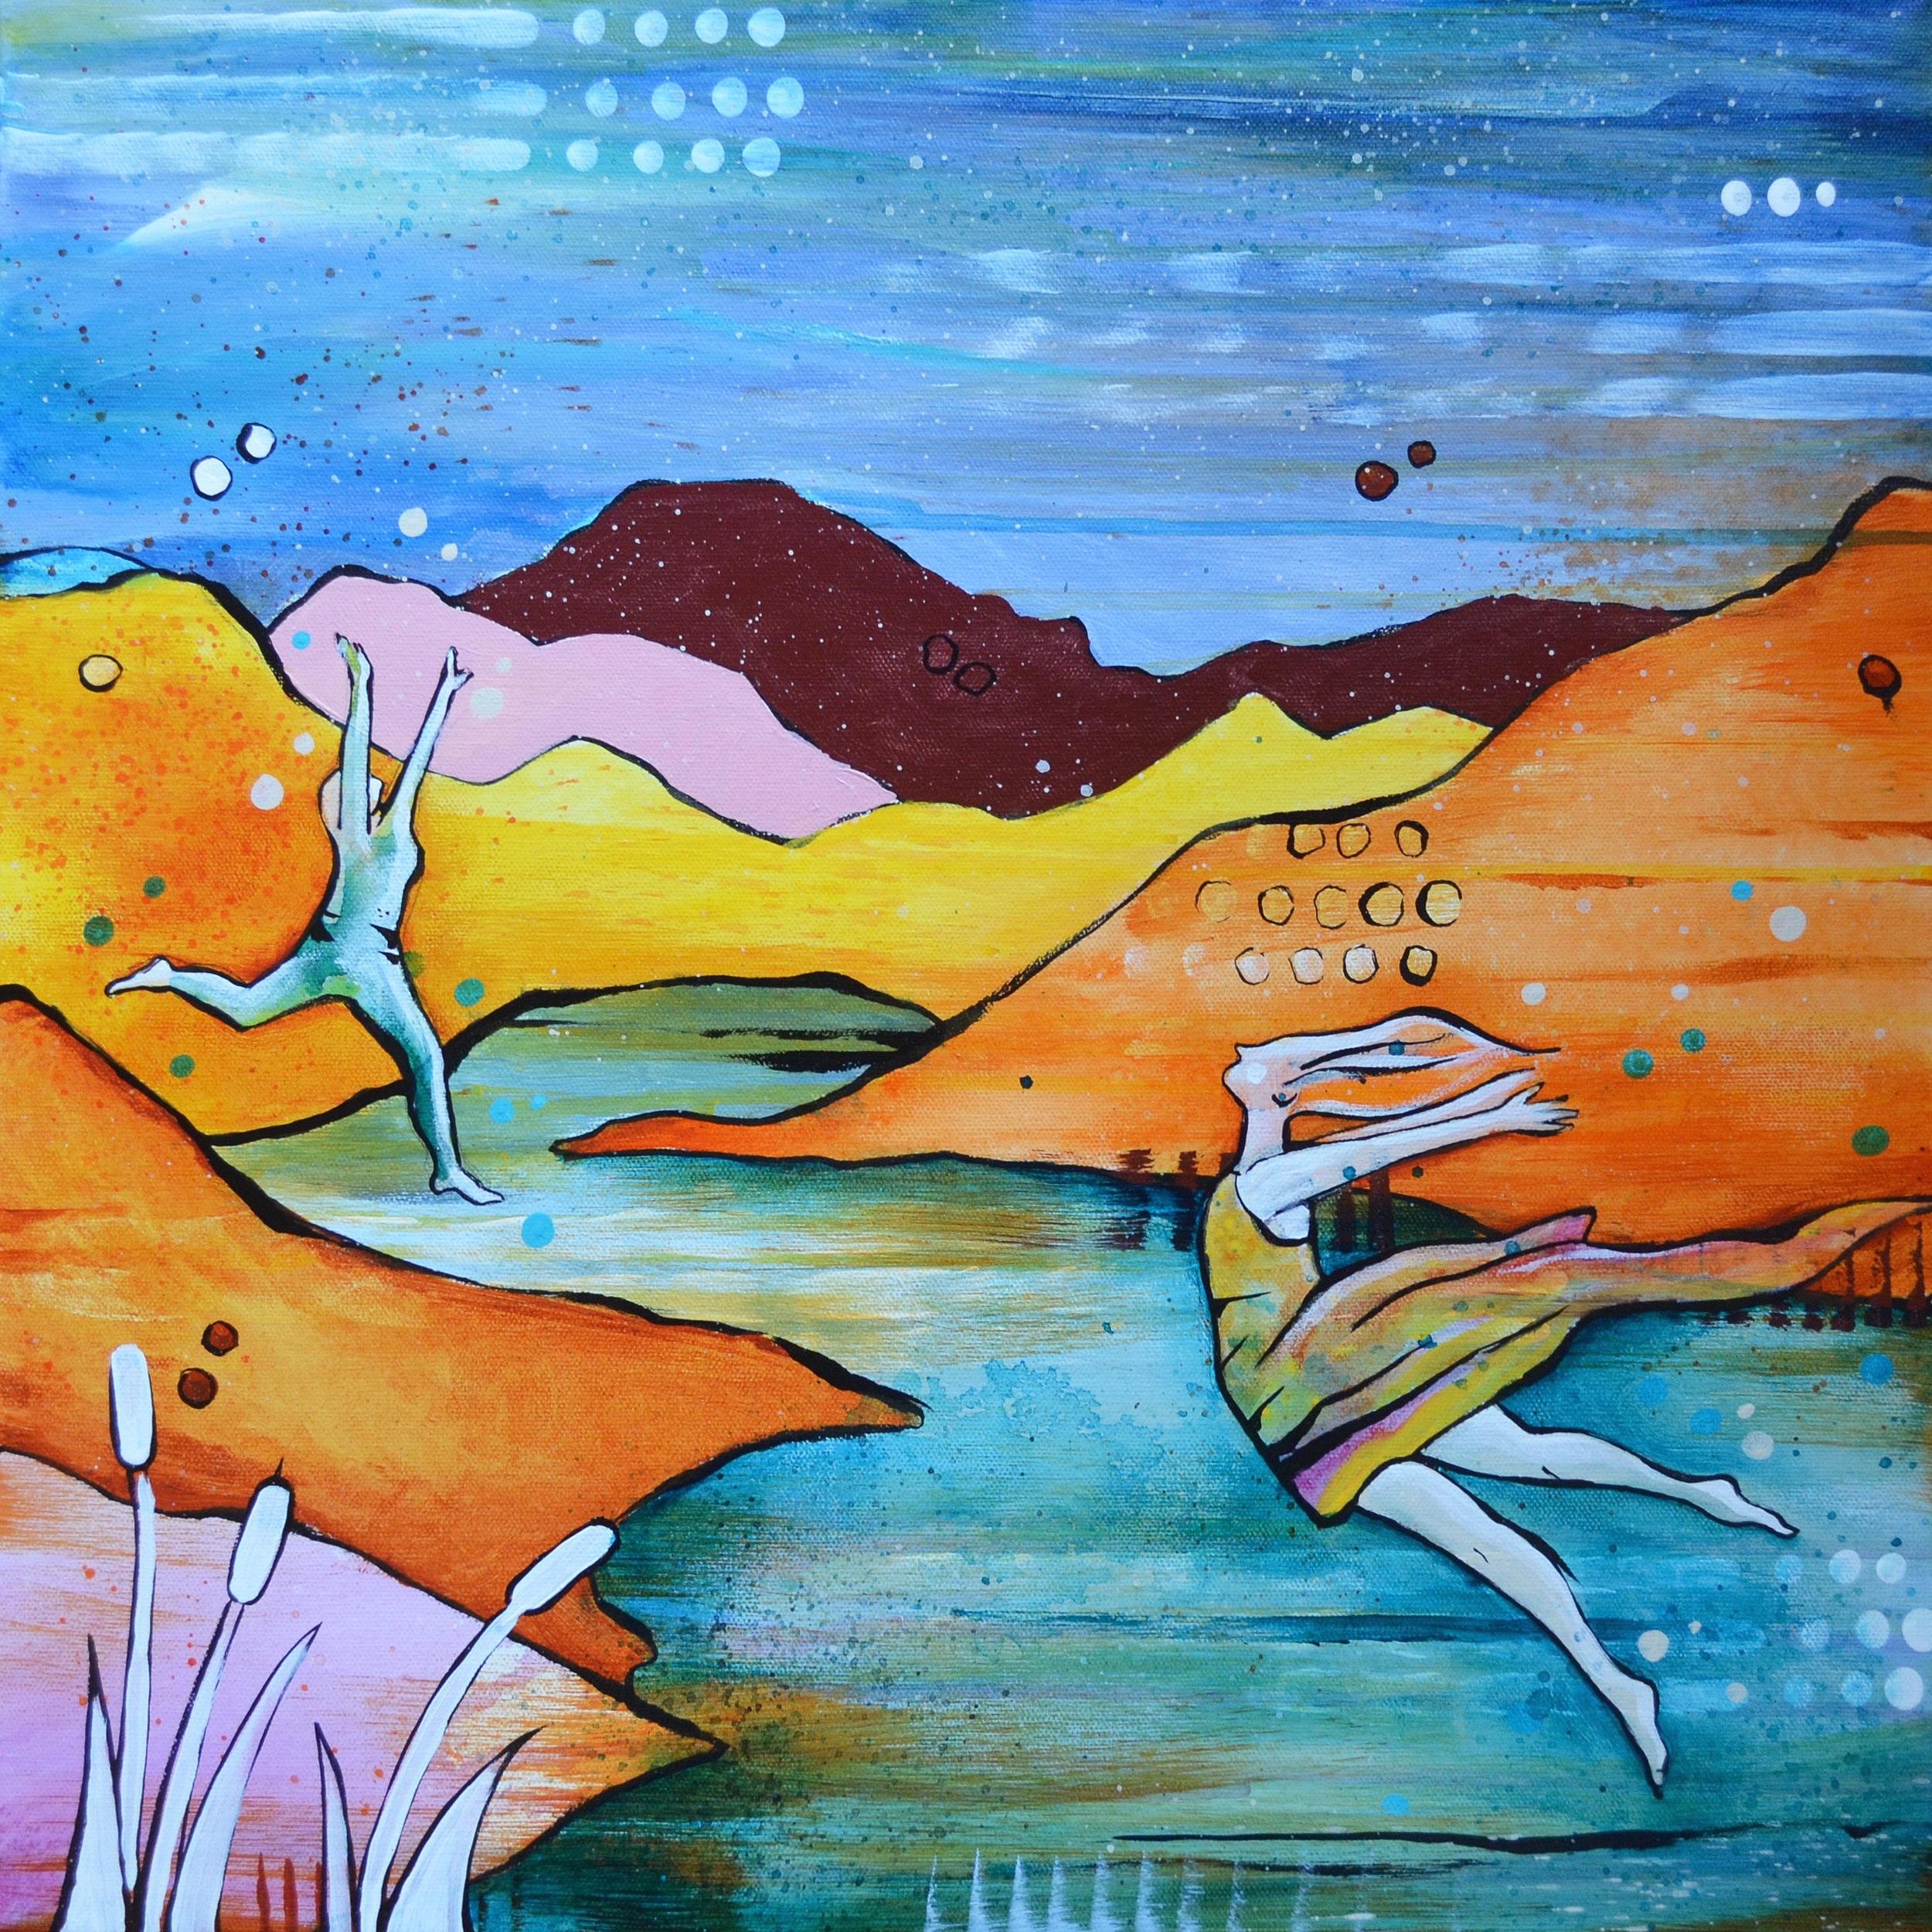 Sunday on the Snake  | 20 x 20 inch acrylic on canvas